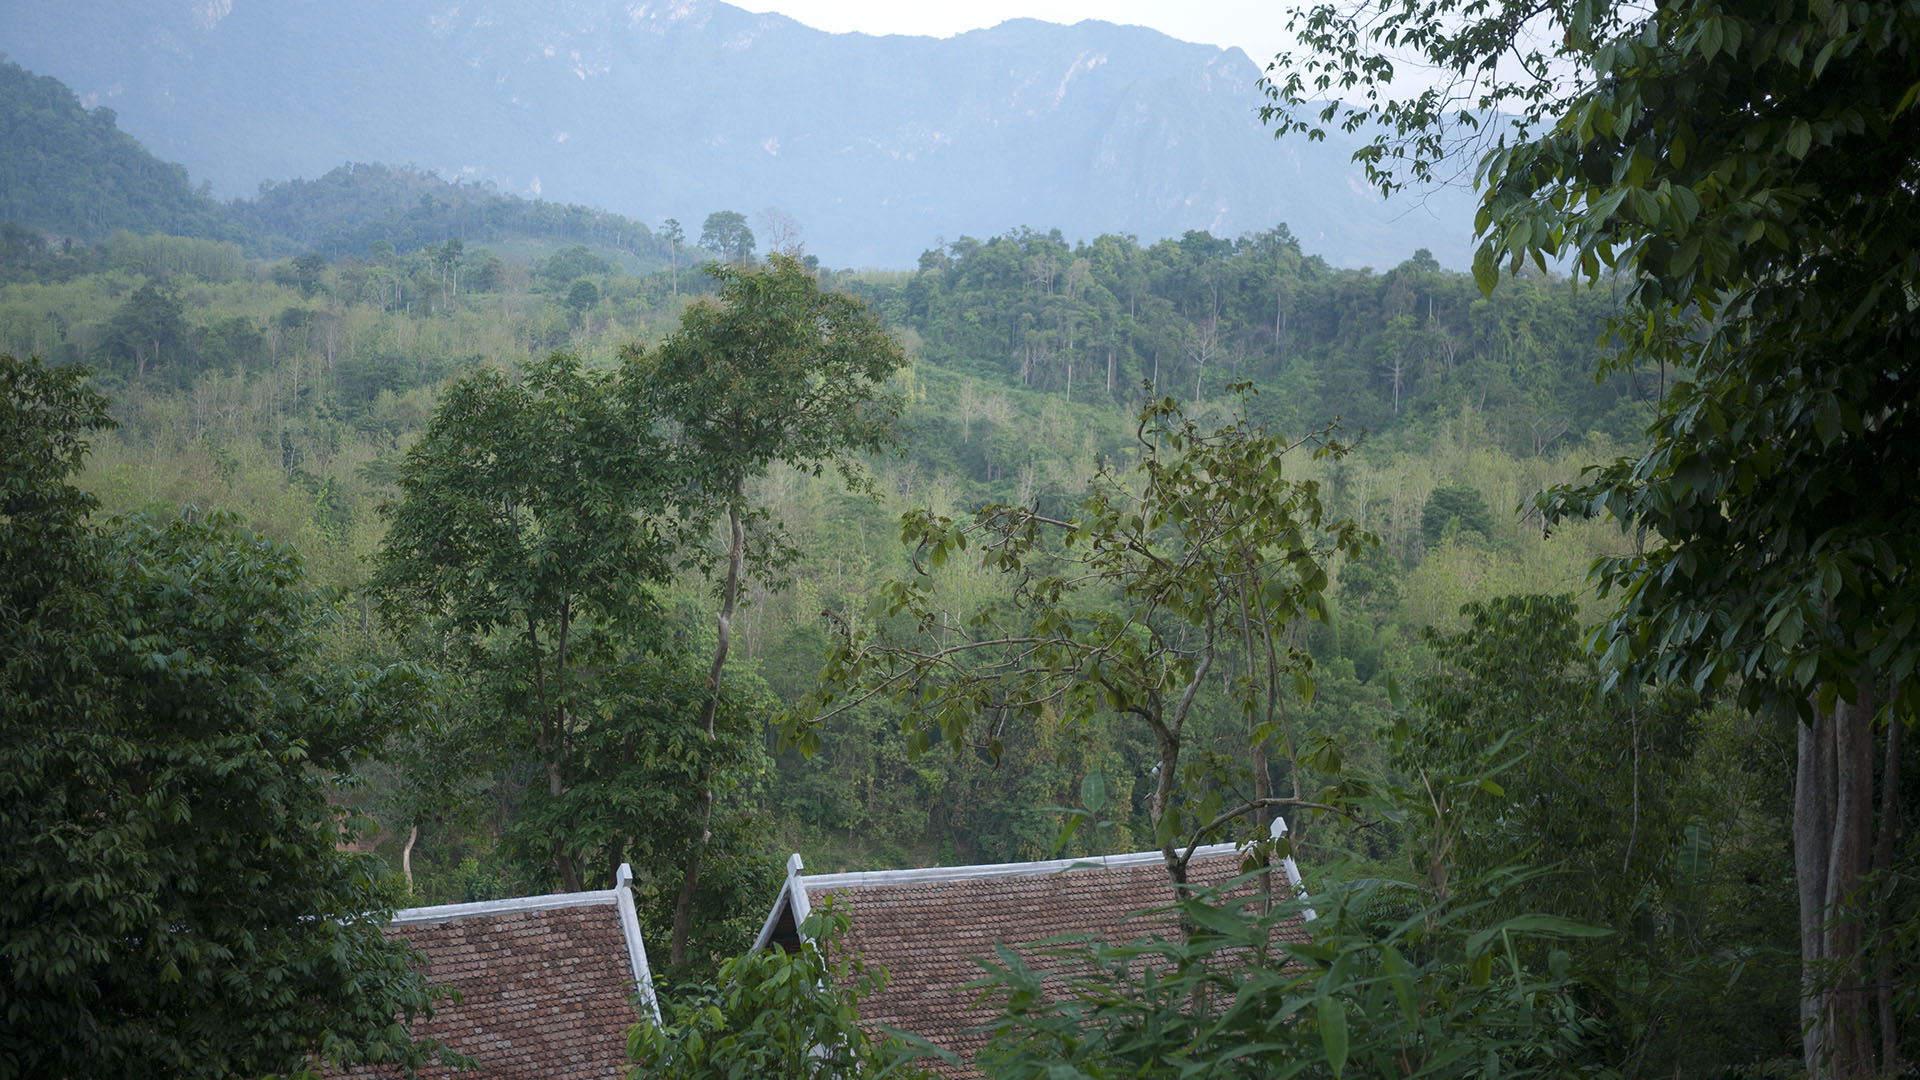 laos trees